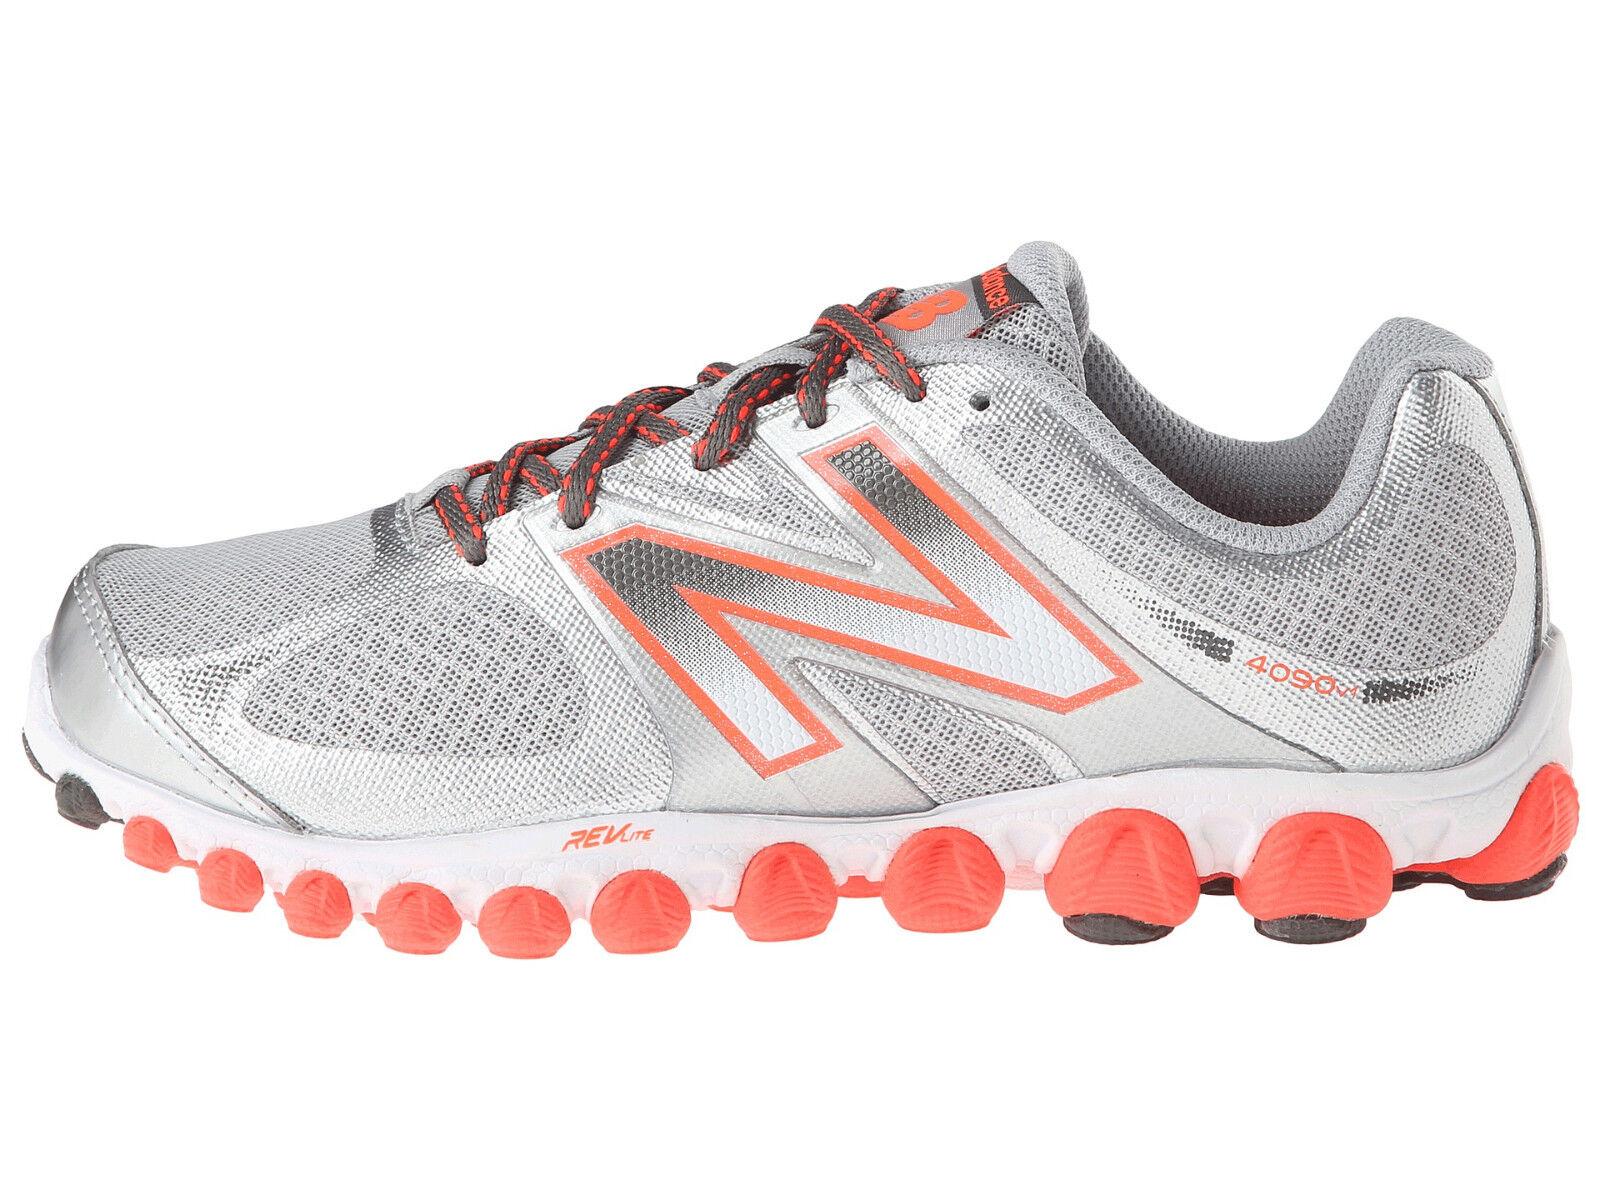 New  Schuhes Damenschuhe New Balance 4090 Running Sneakers Schuhes  - limited Größes f9dbb3